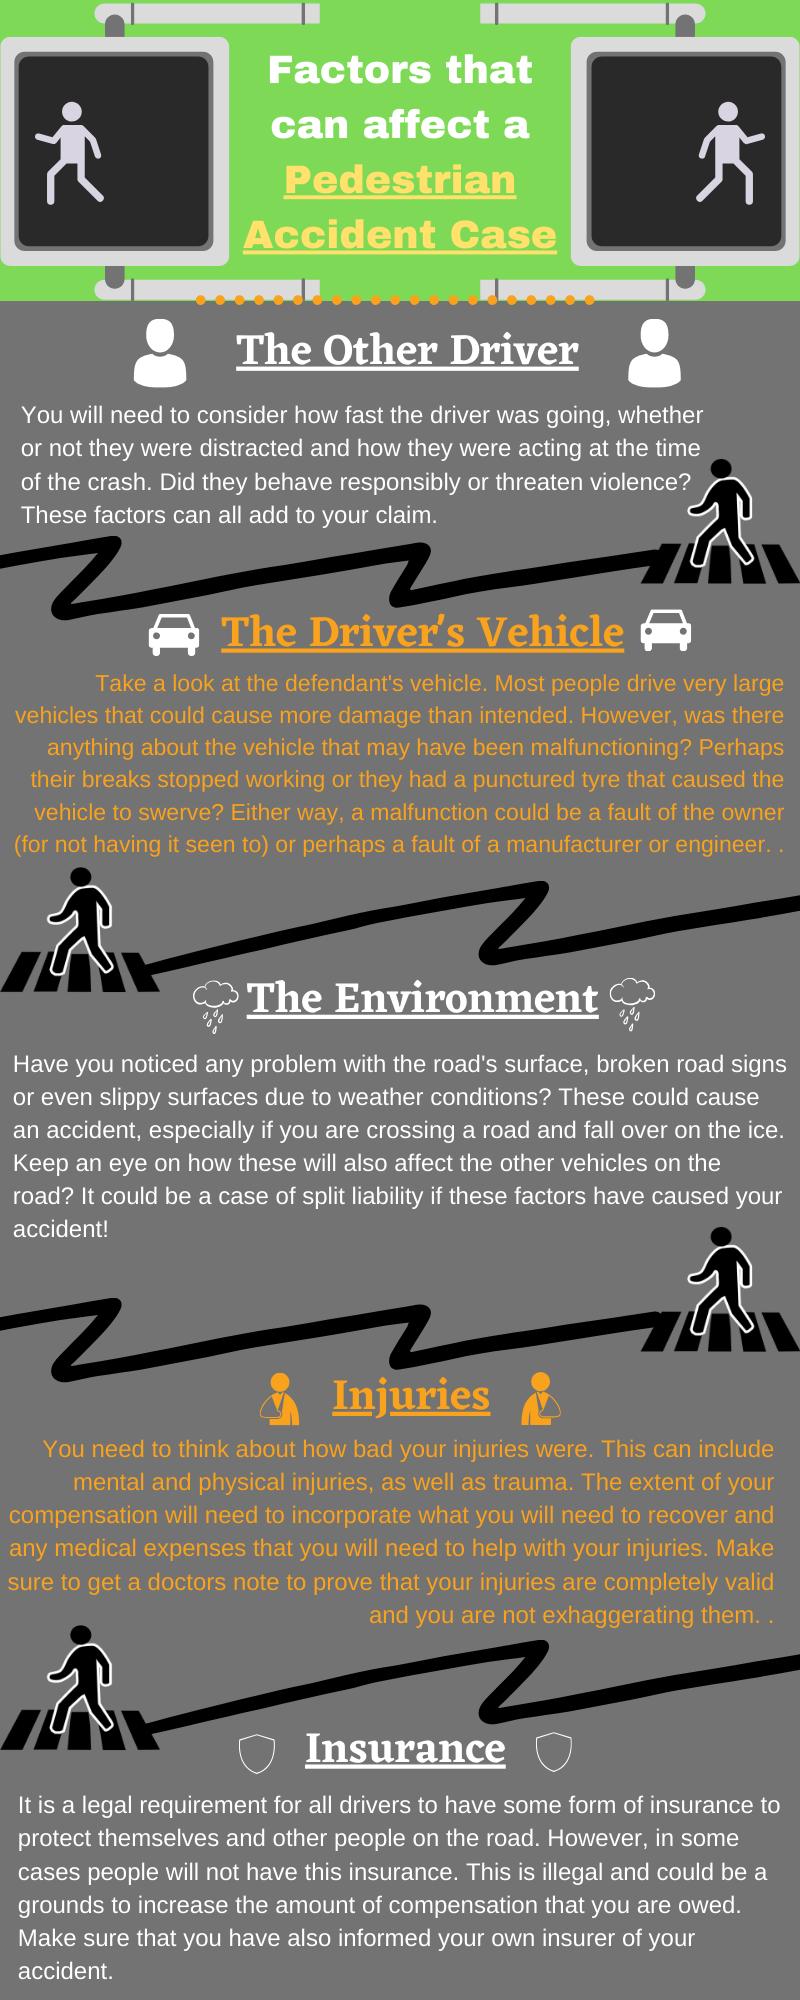 pedestrian accident factors